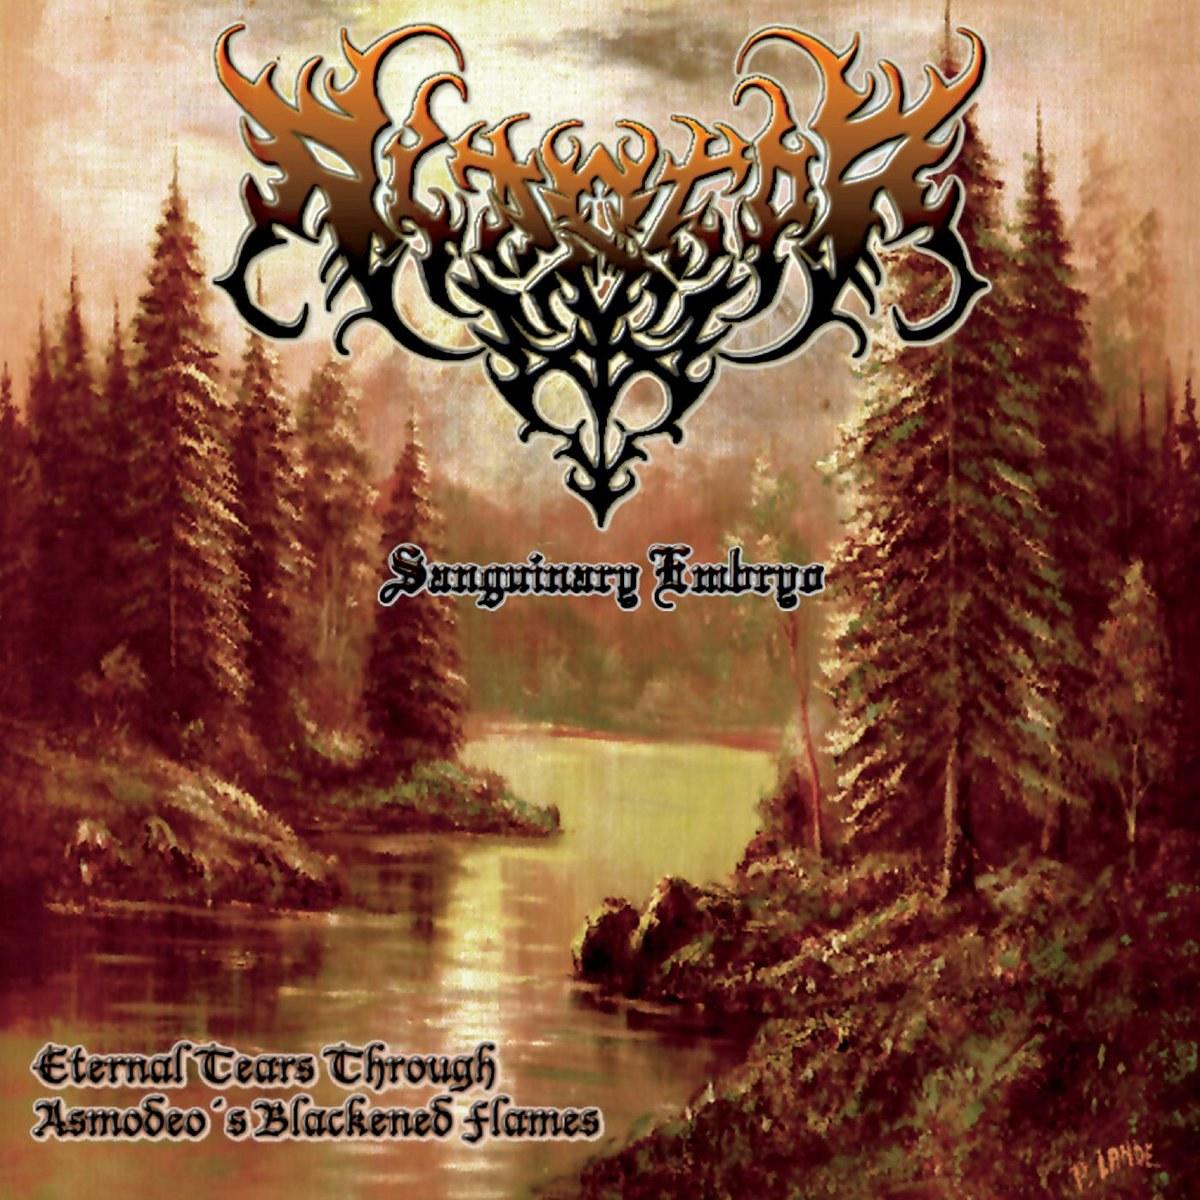 Best Costa Rican Black Metal album: Alastor Sanguinary Embryo - Eternal Tears through Asmodeo's Blackened Flames